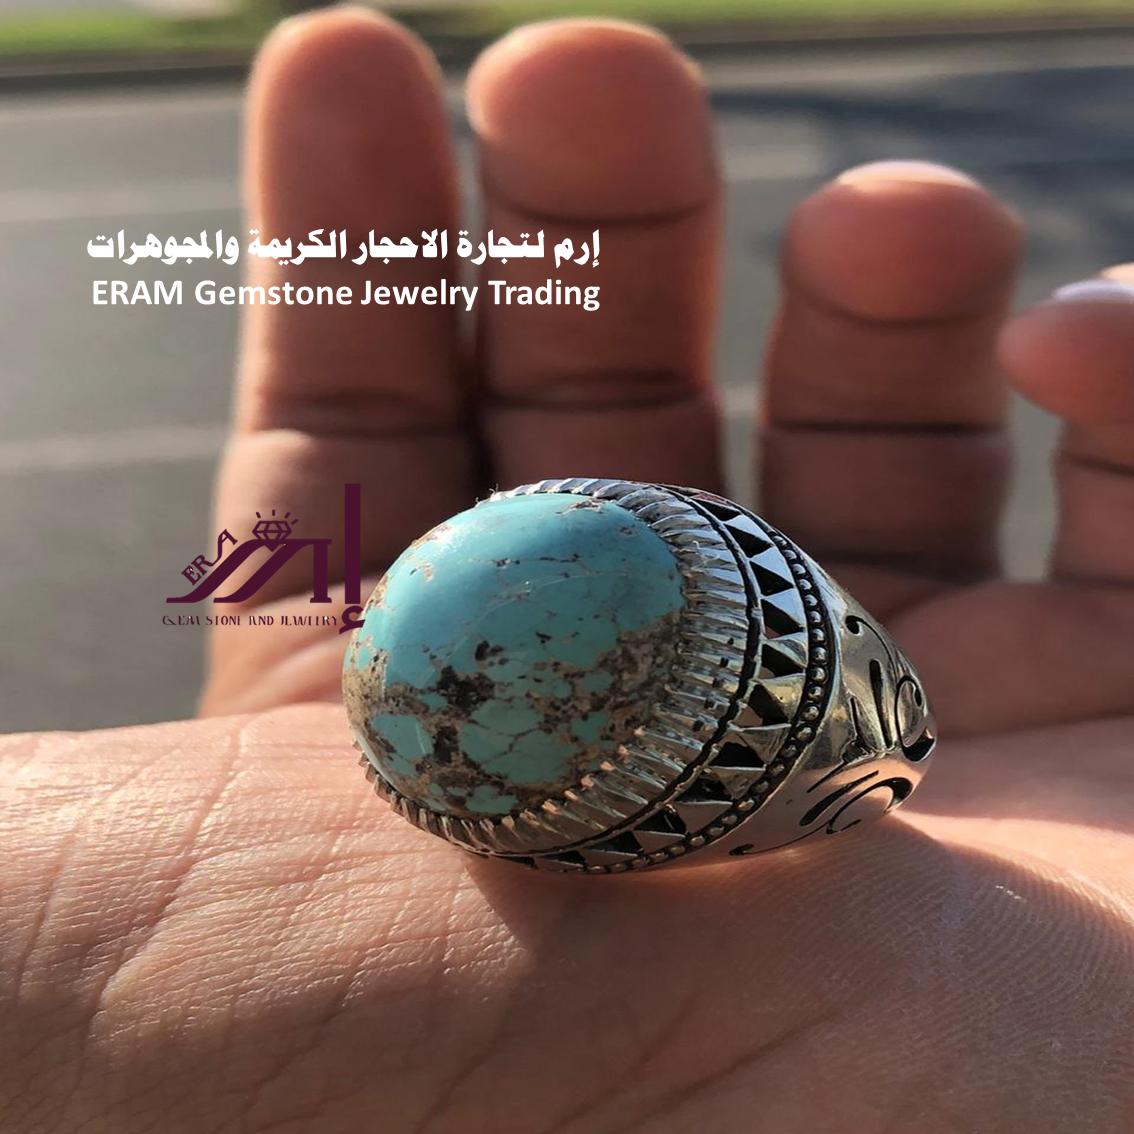 ما تفكر فيه نحن نقدمه اليك خاتم ملكي فيروز نيشابوري طبيعي100 Turquoise للعرض Gemstones Gemstone Jewelry Gemstone Rings